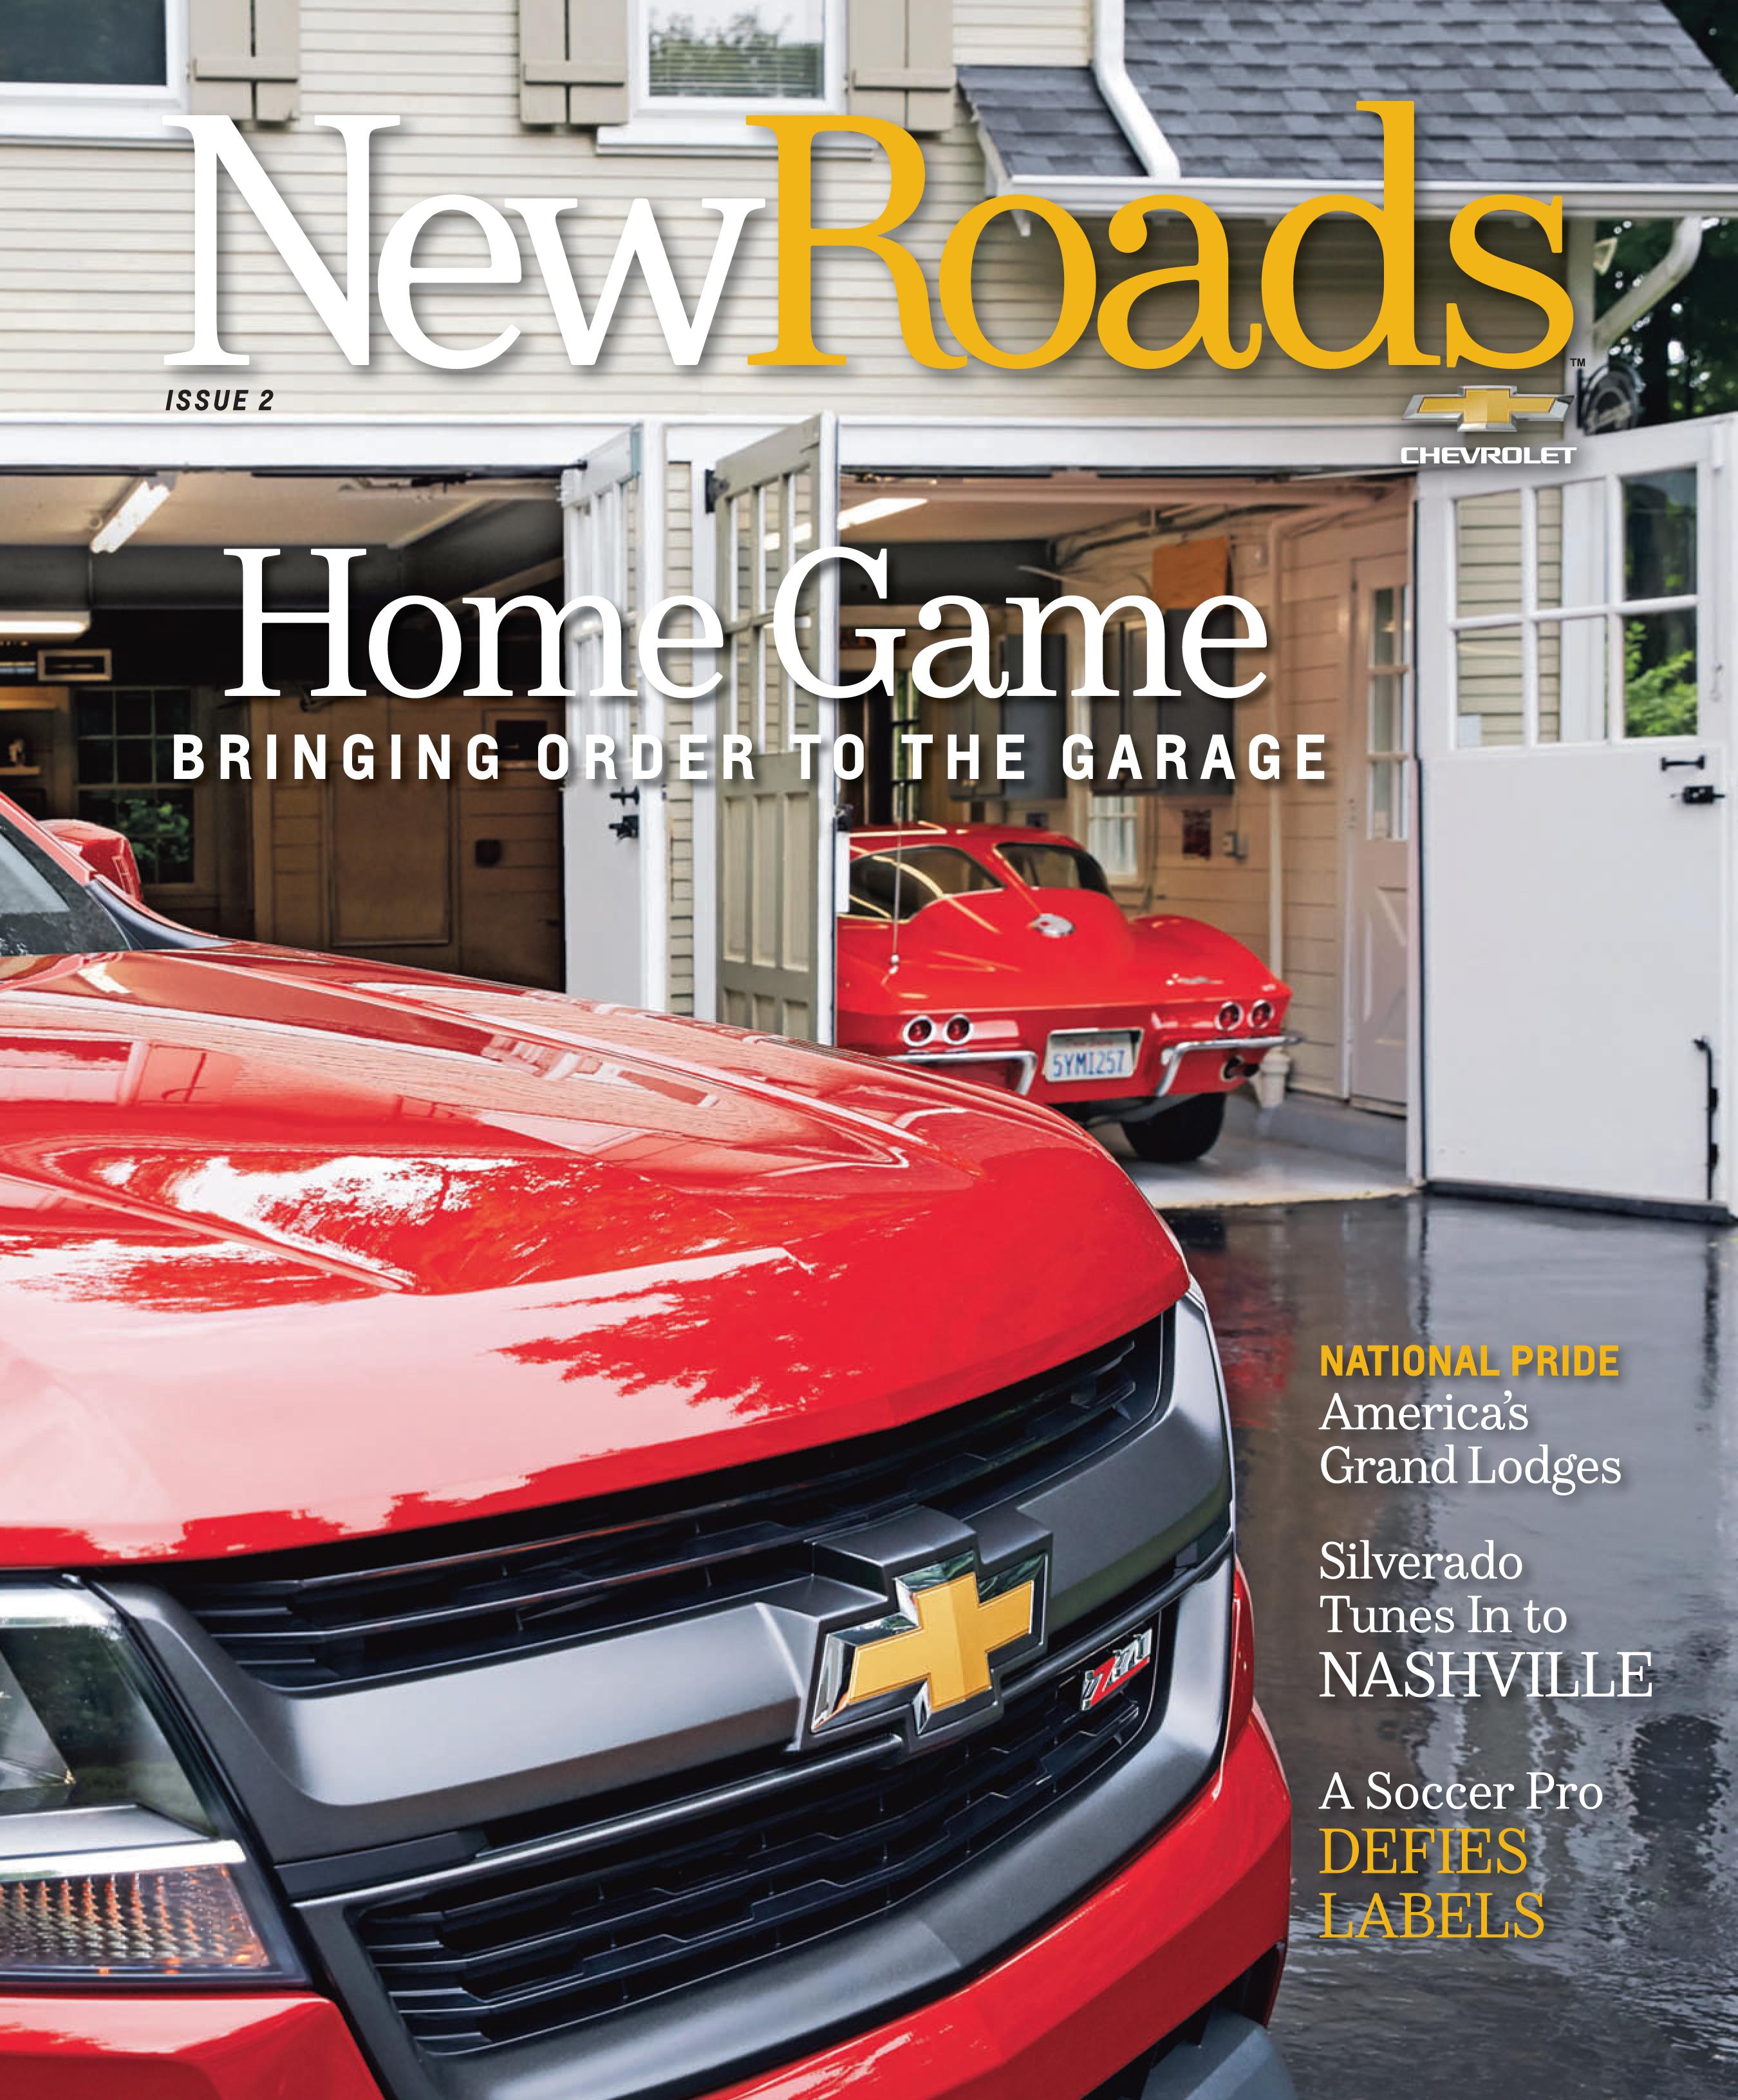 Chevrolet New Roads Magazine Issue 2 Free Pdf Download